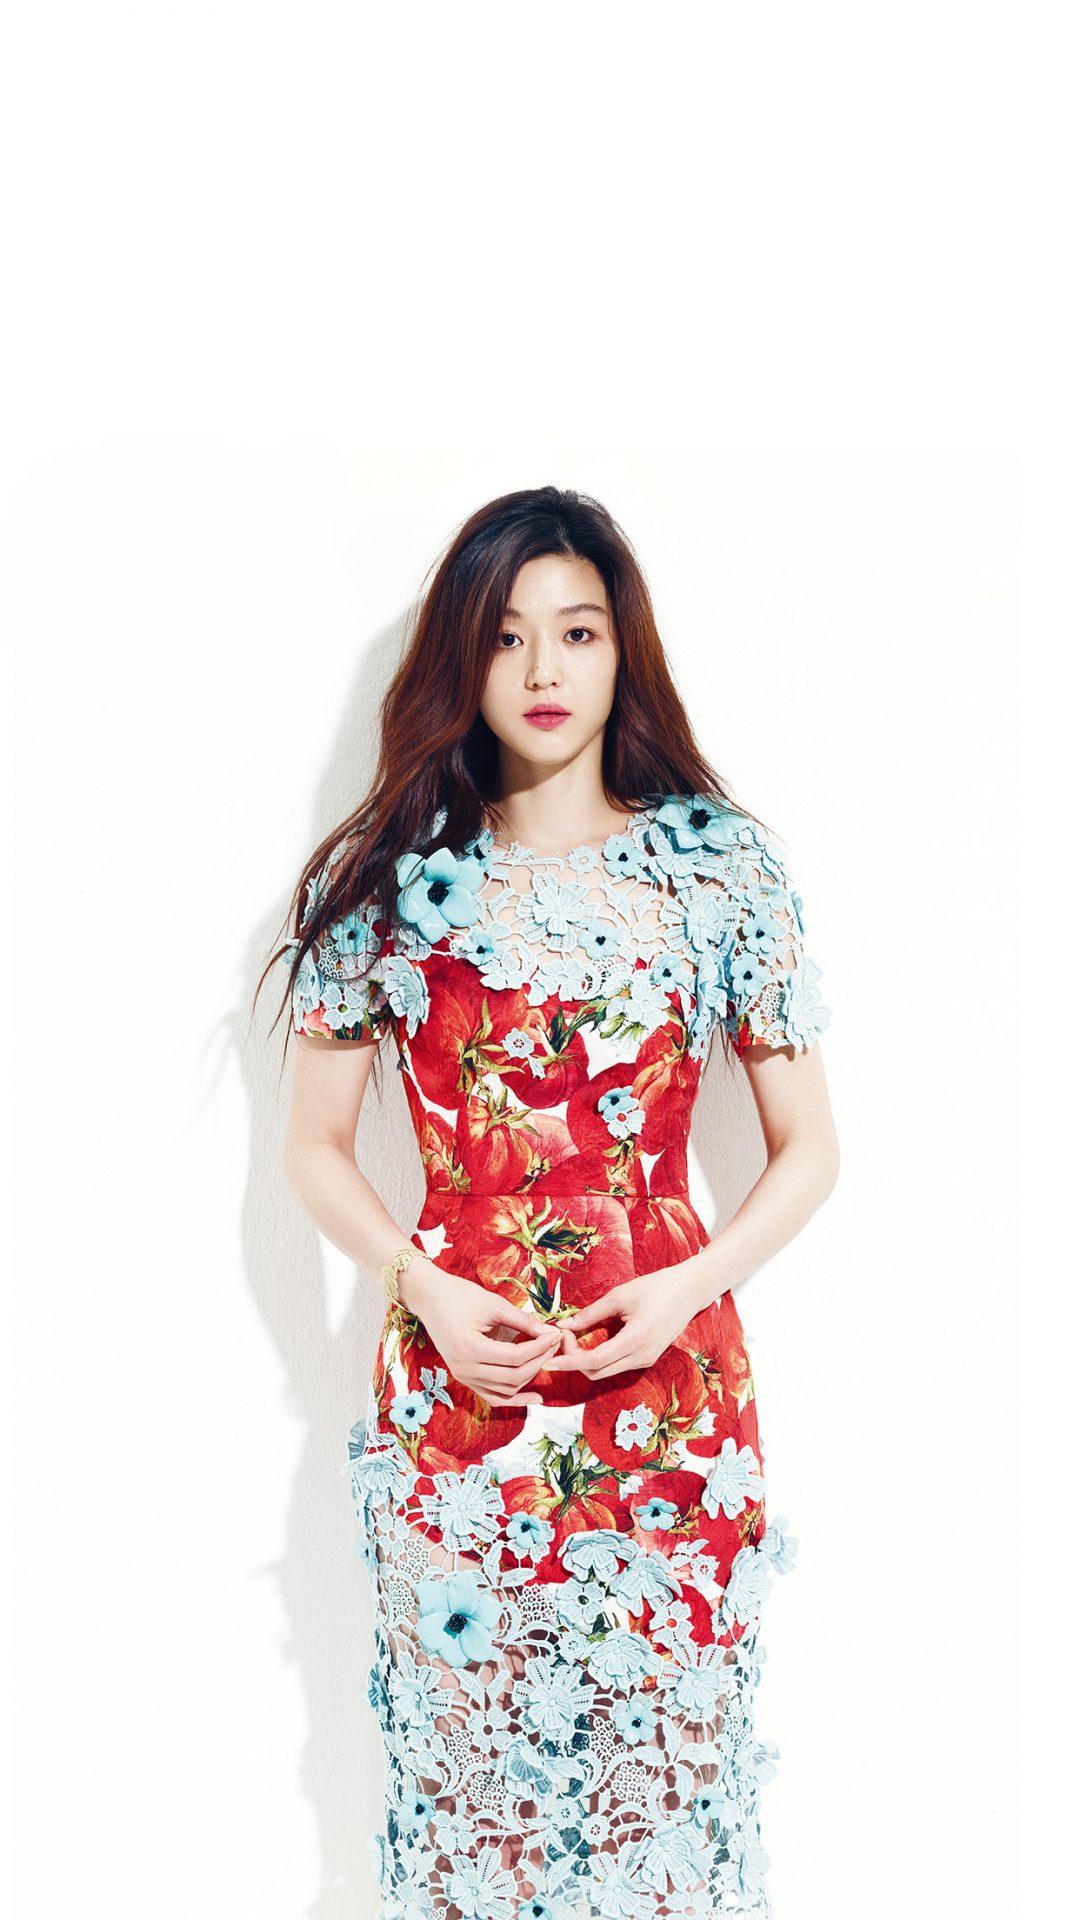 Jun Ji Hyun Actress Kpop Cute Beauty Celebrity